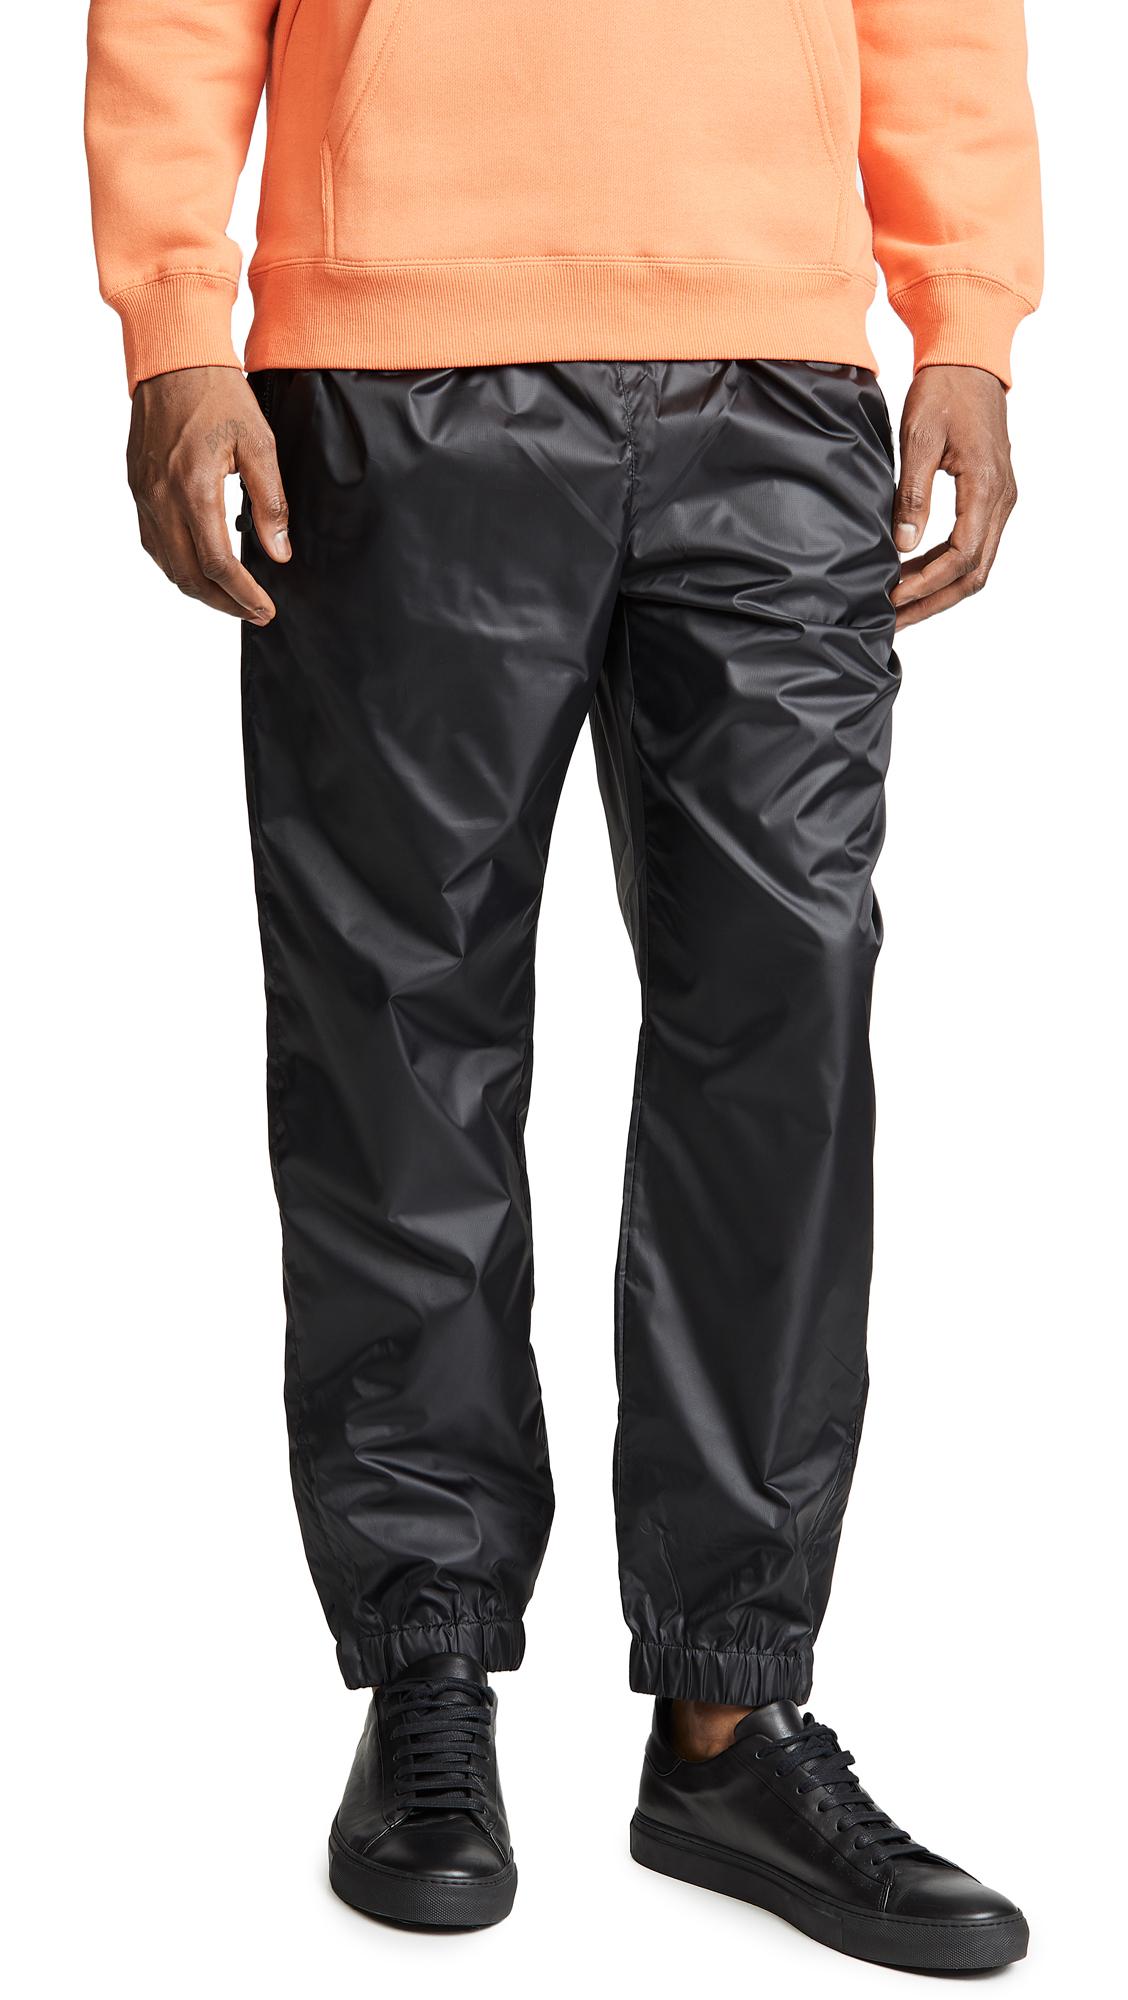 0a03d94796b1 Stussy Micro Rip Pants